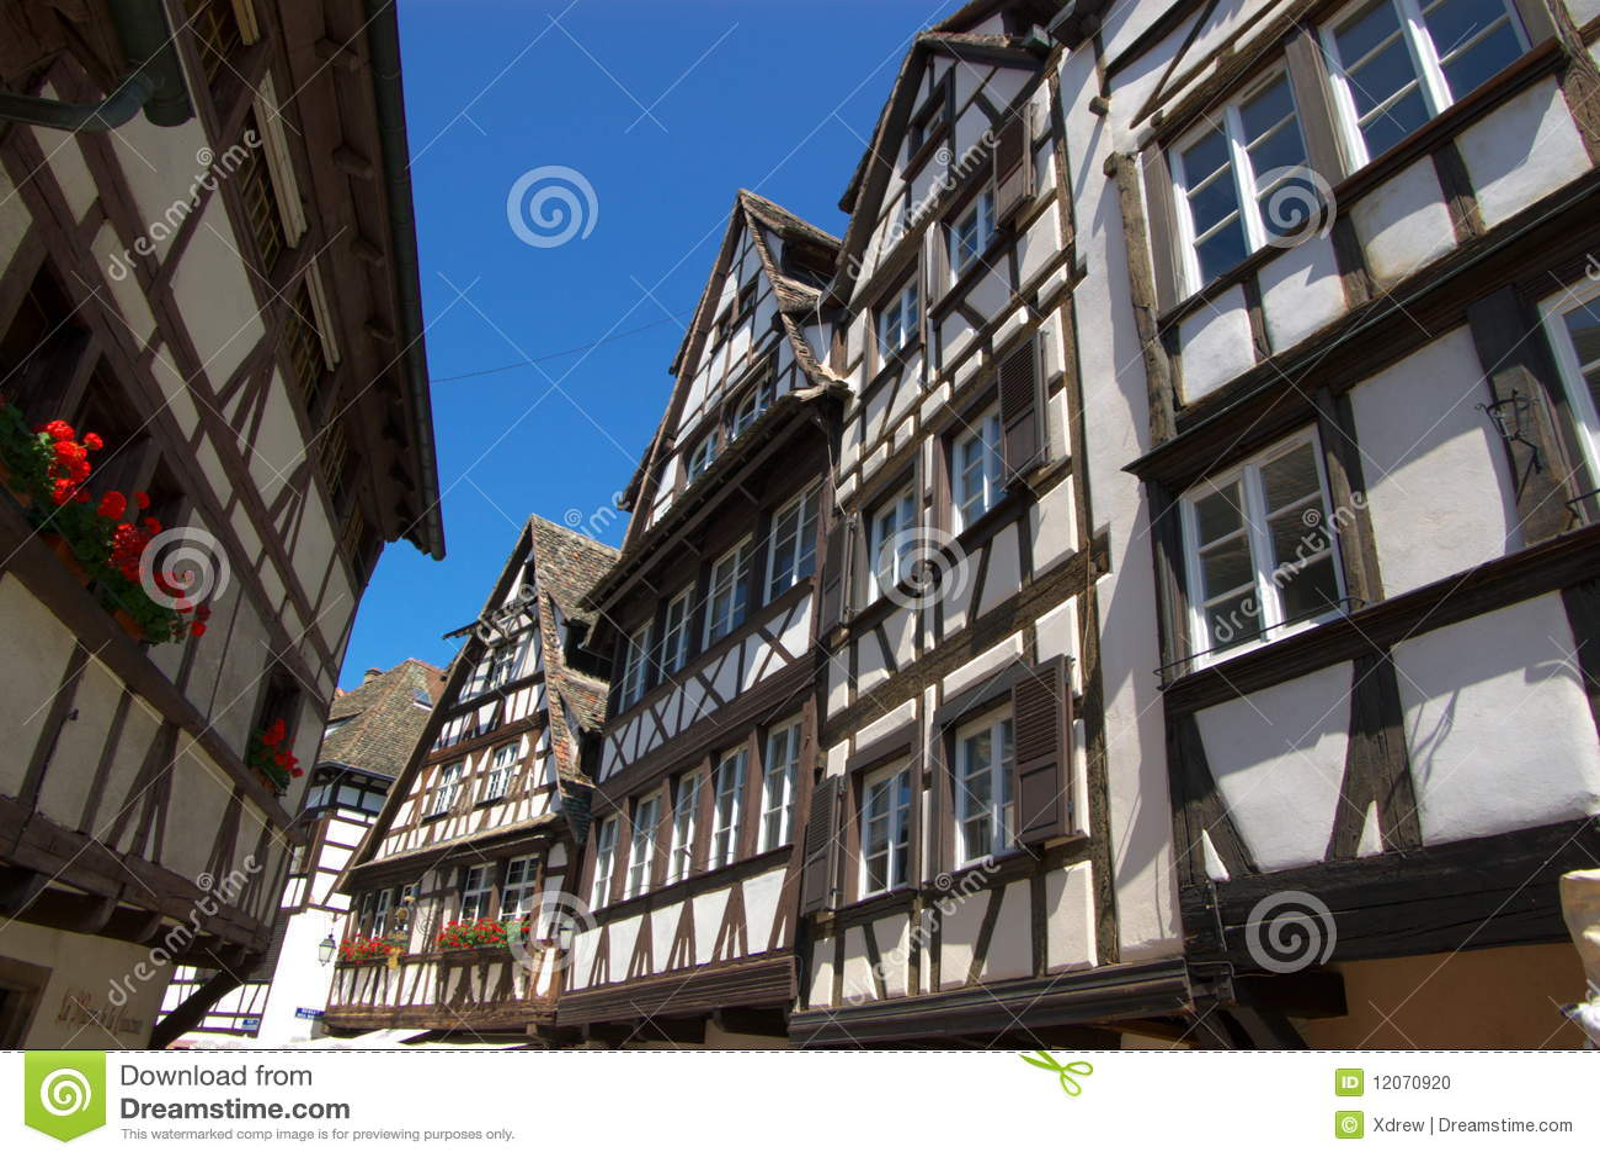 Strasbourg architecture stock photo image 12070920 for Strasbourg architecture